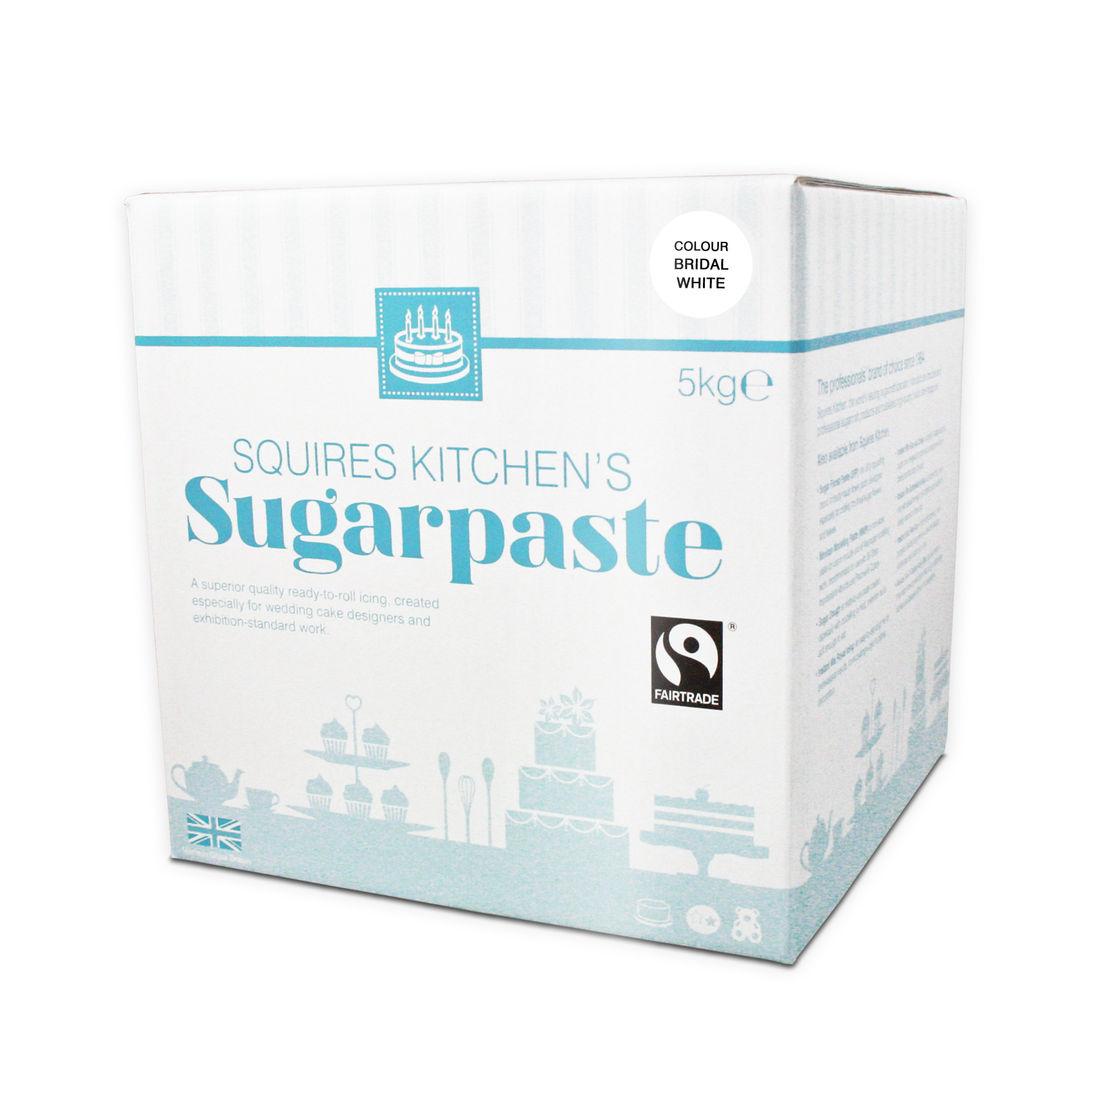 Sugarpaste 5kg